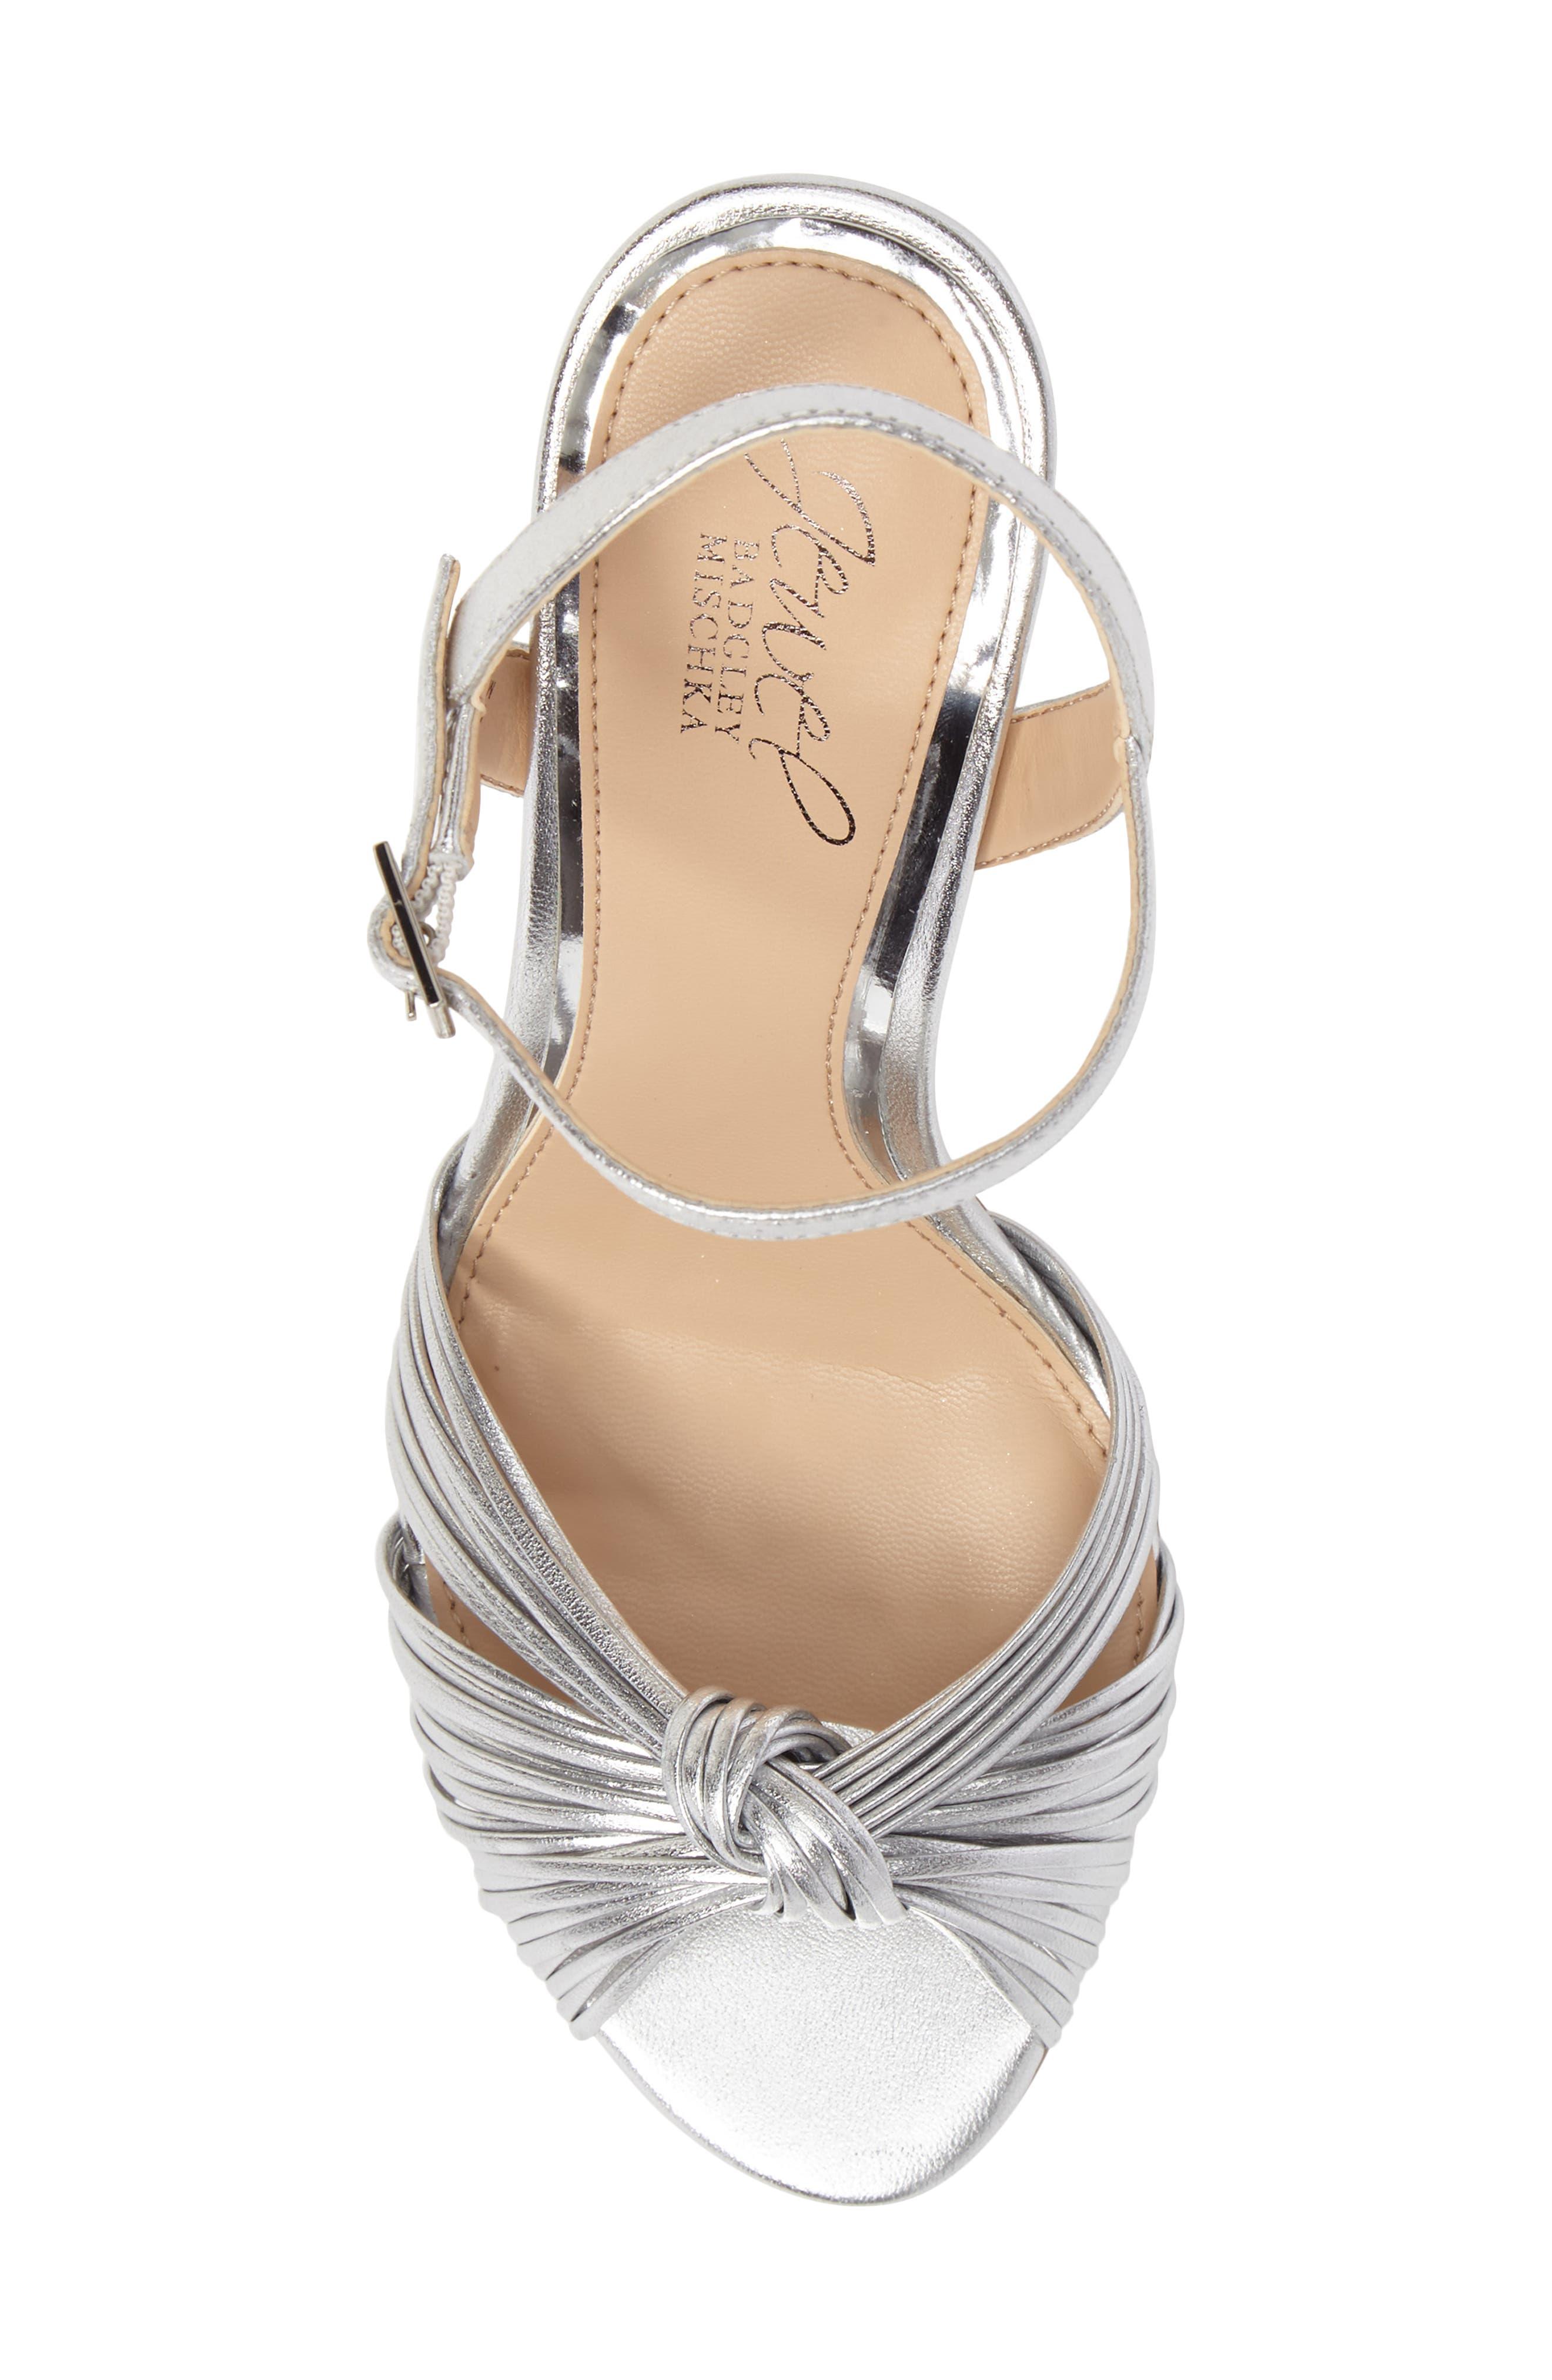 Lady Ankle Strap Sandal,                             Alternate thumbnail 5, color,                             046